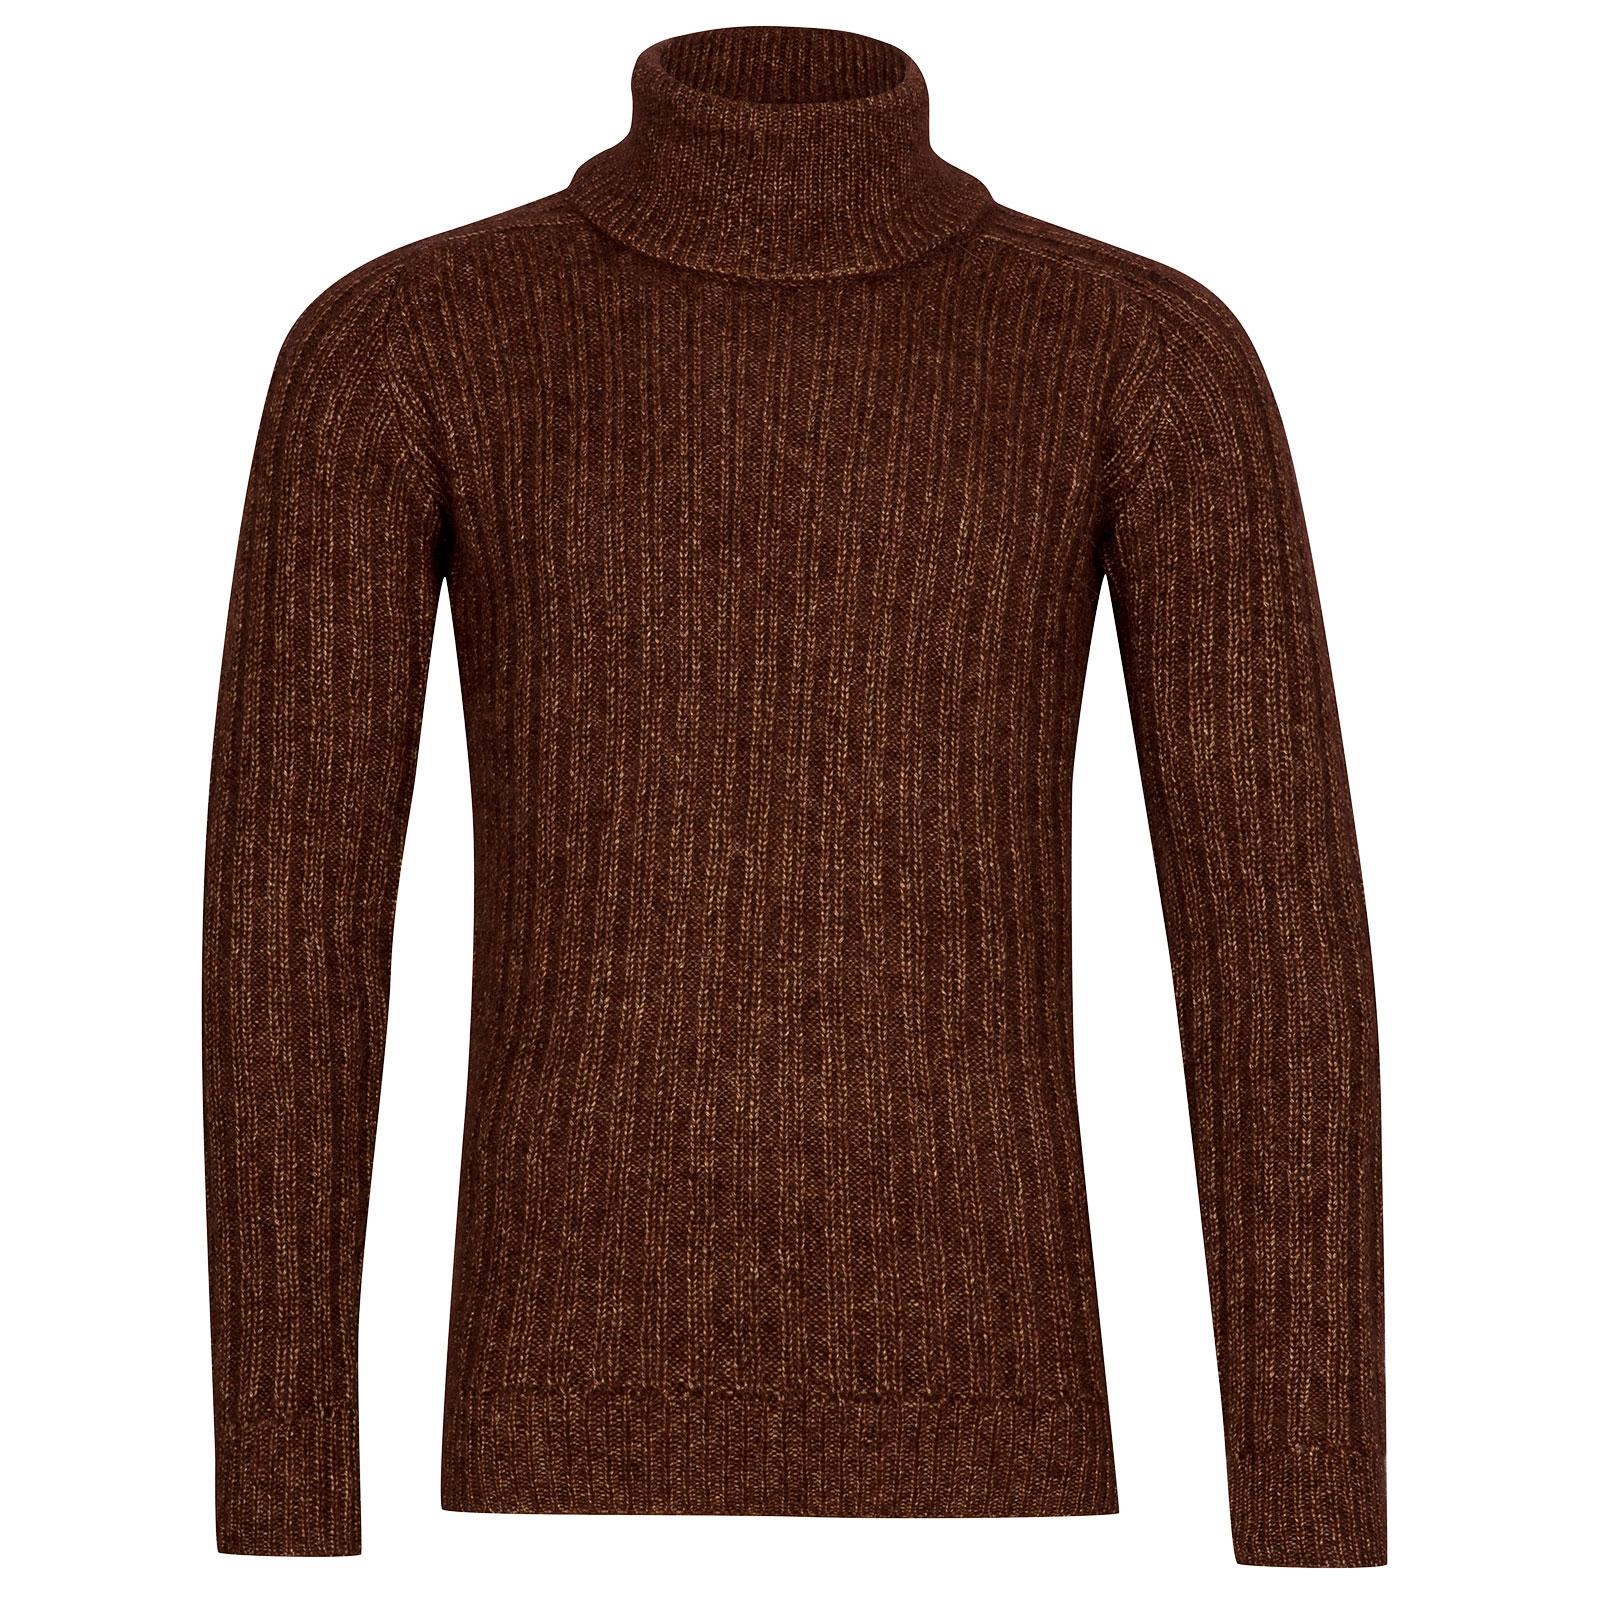 John Smedley Degree Viscose Blend Pullover In Bronze-XL